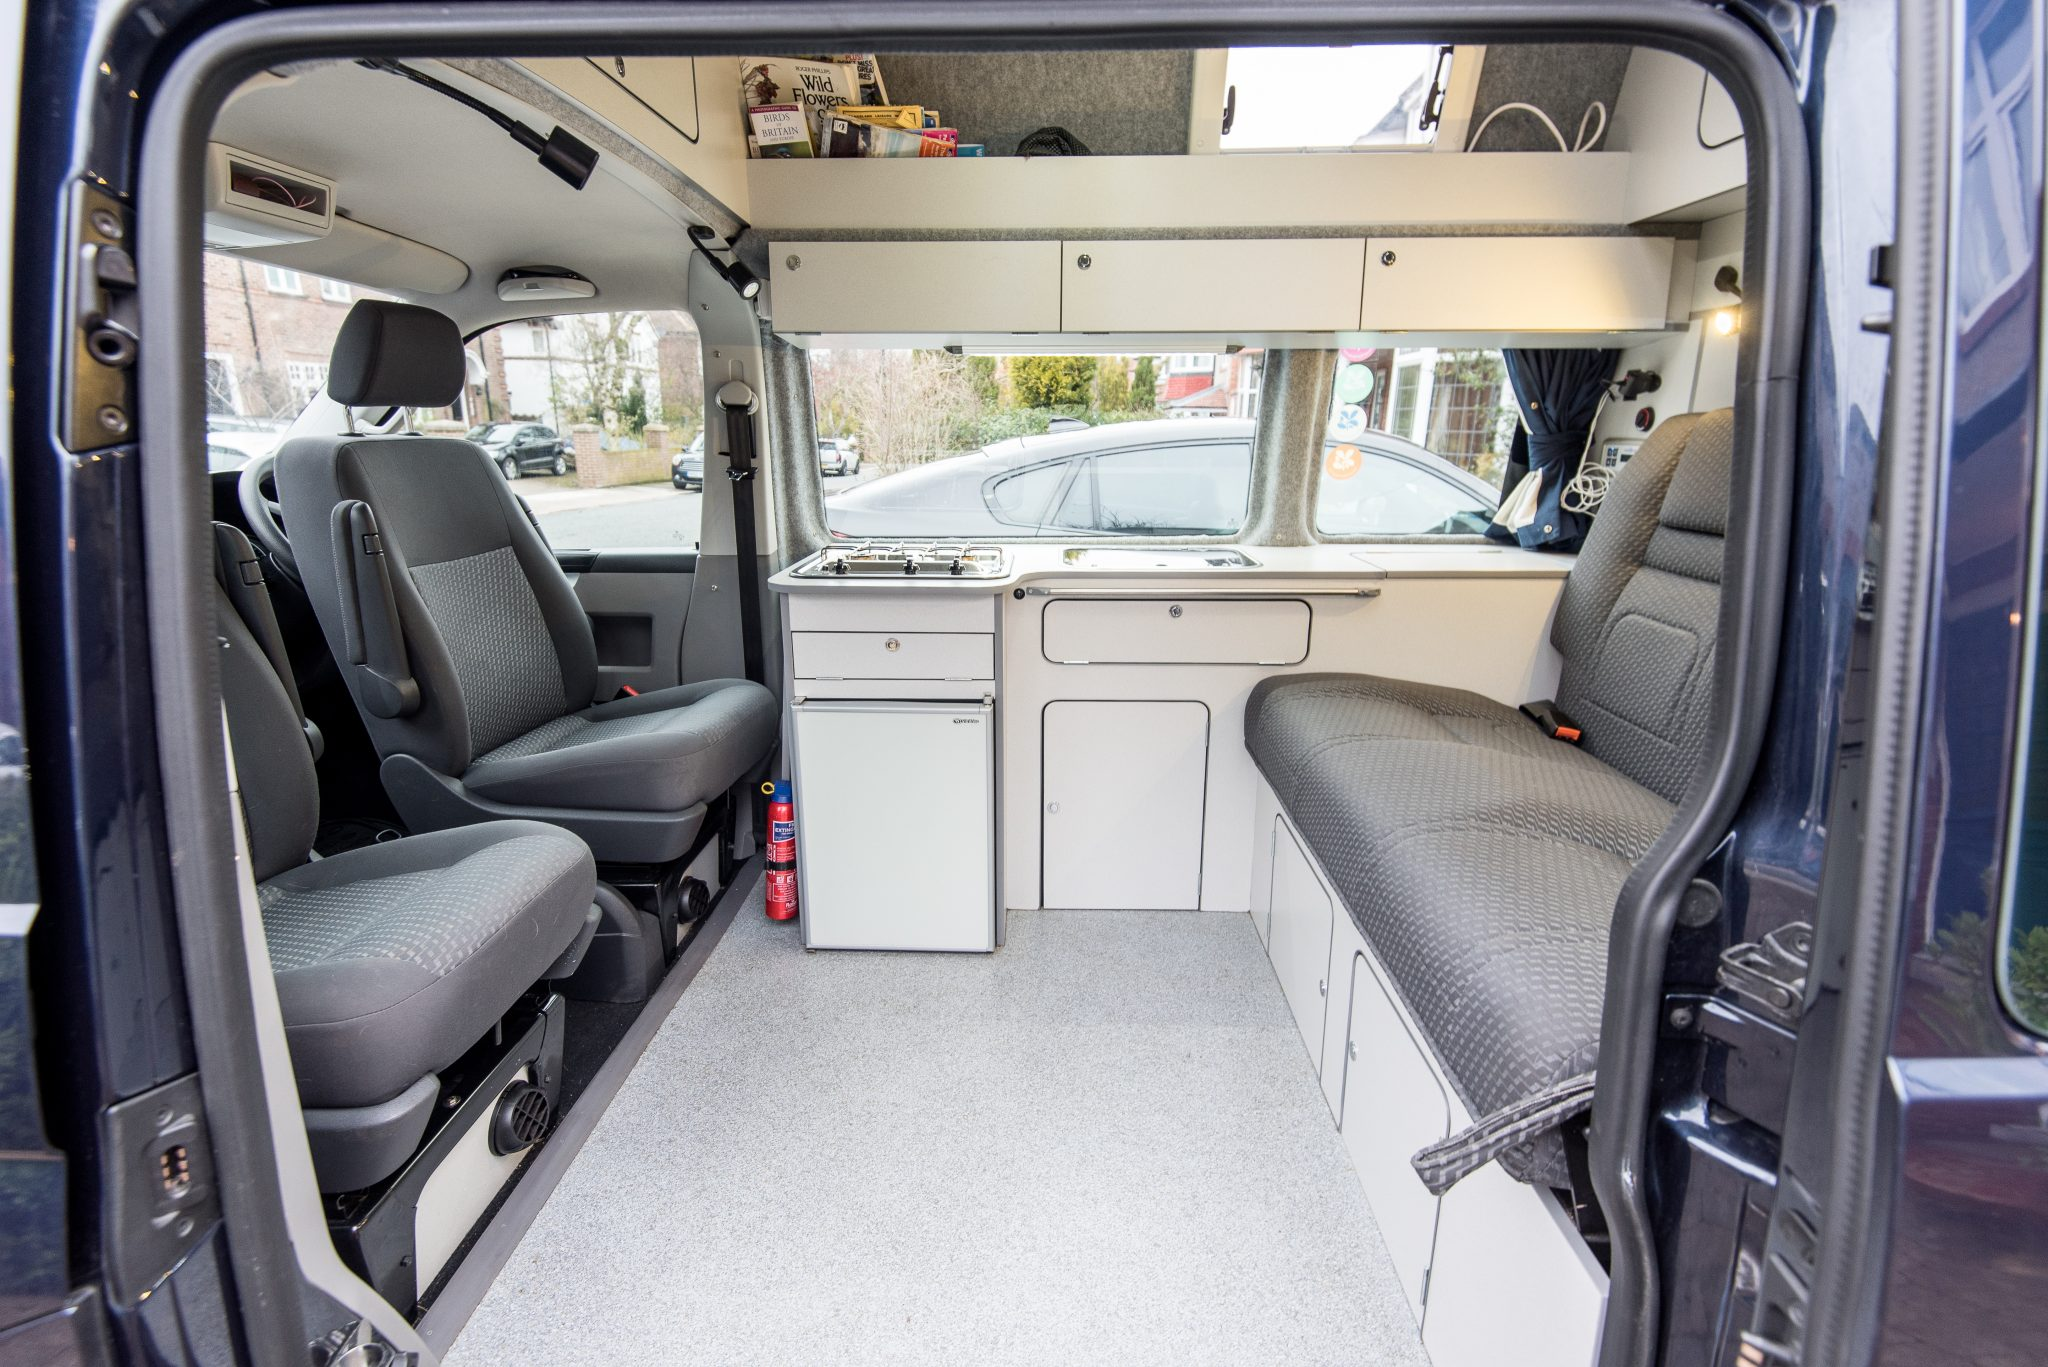 high to camper van for sale